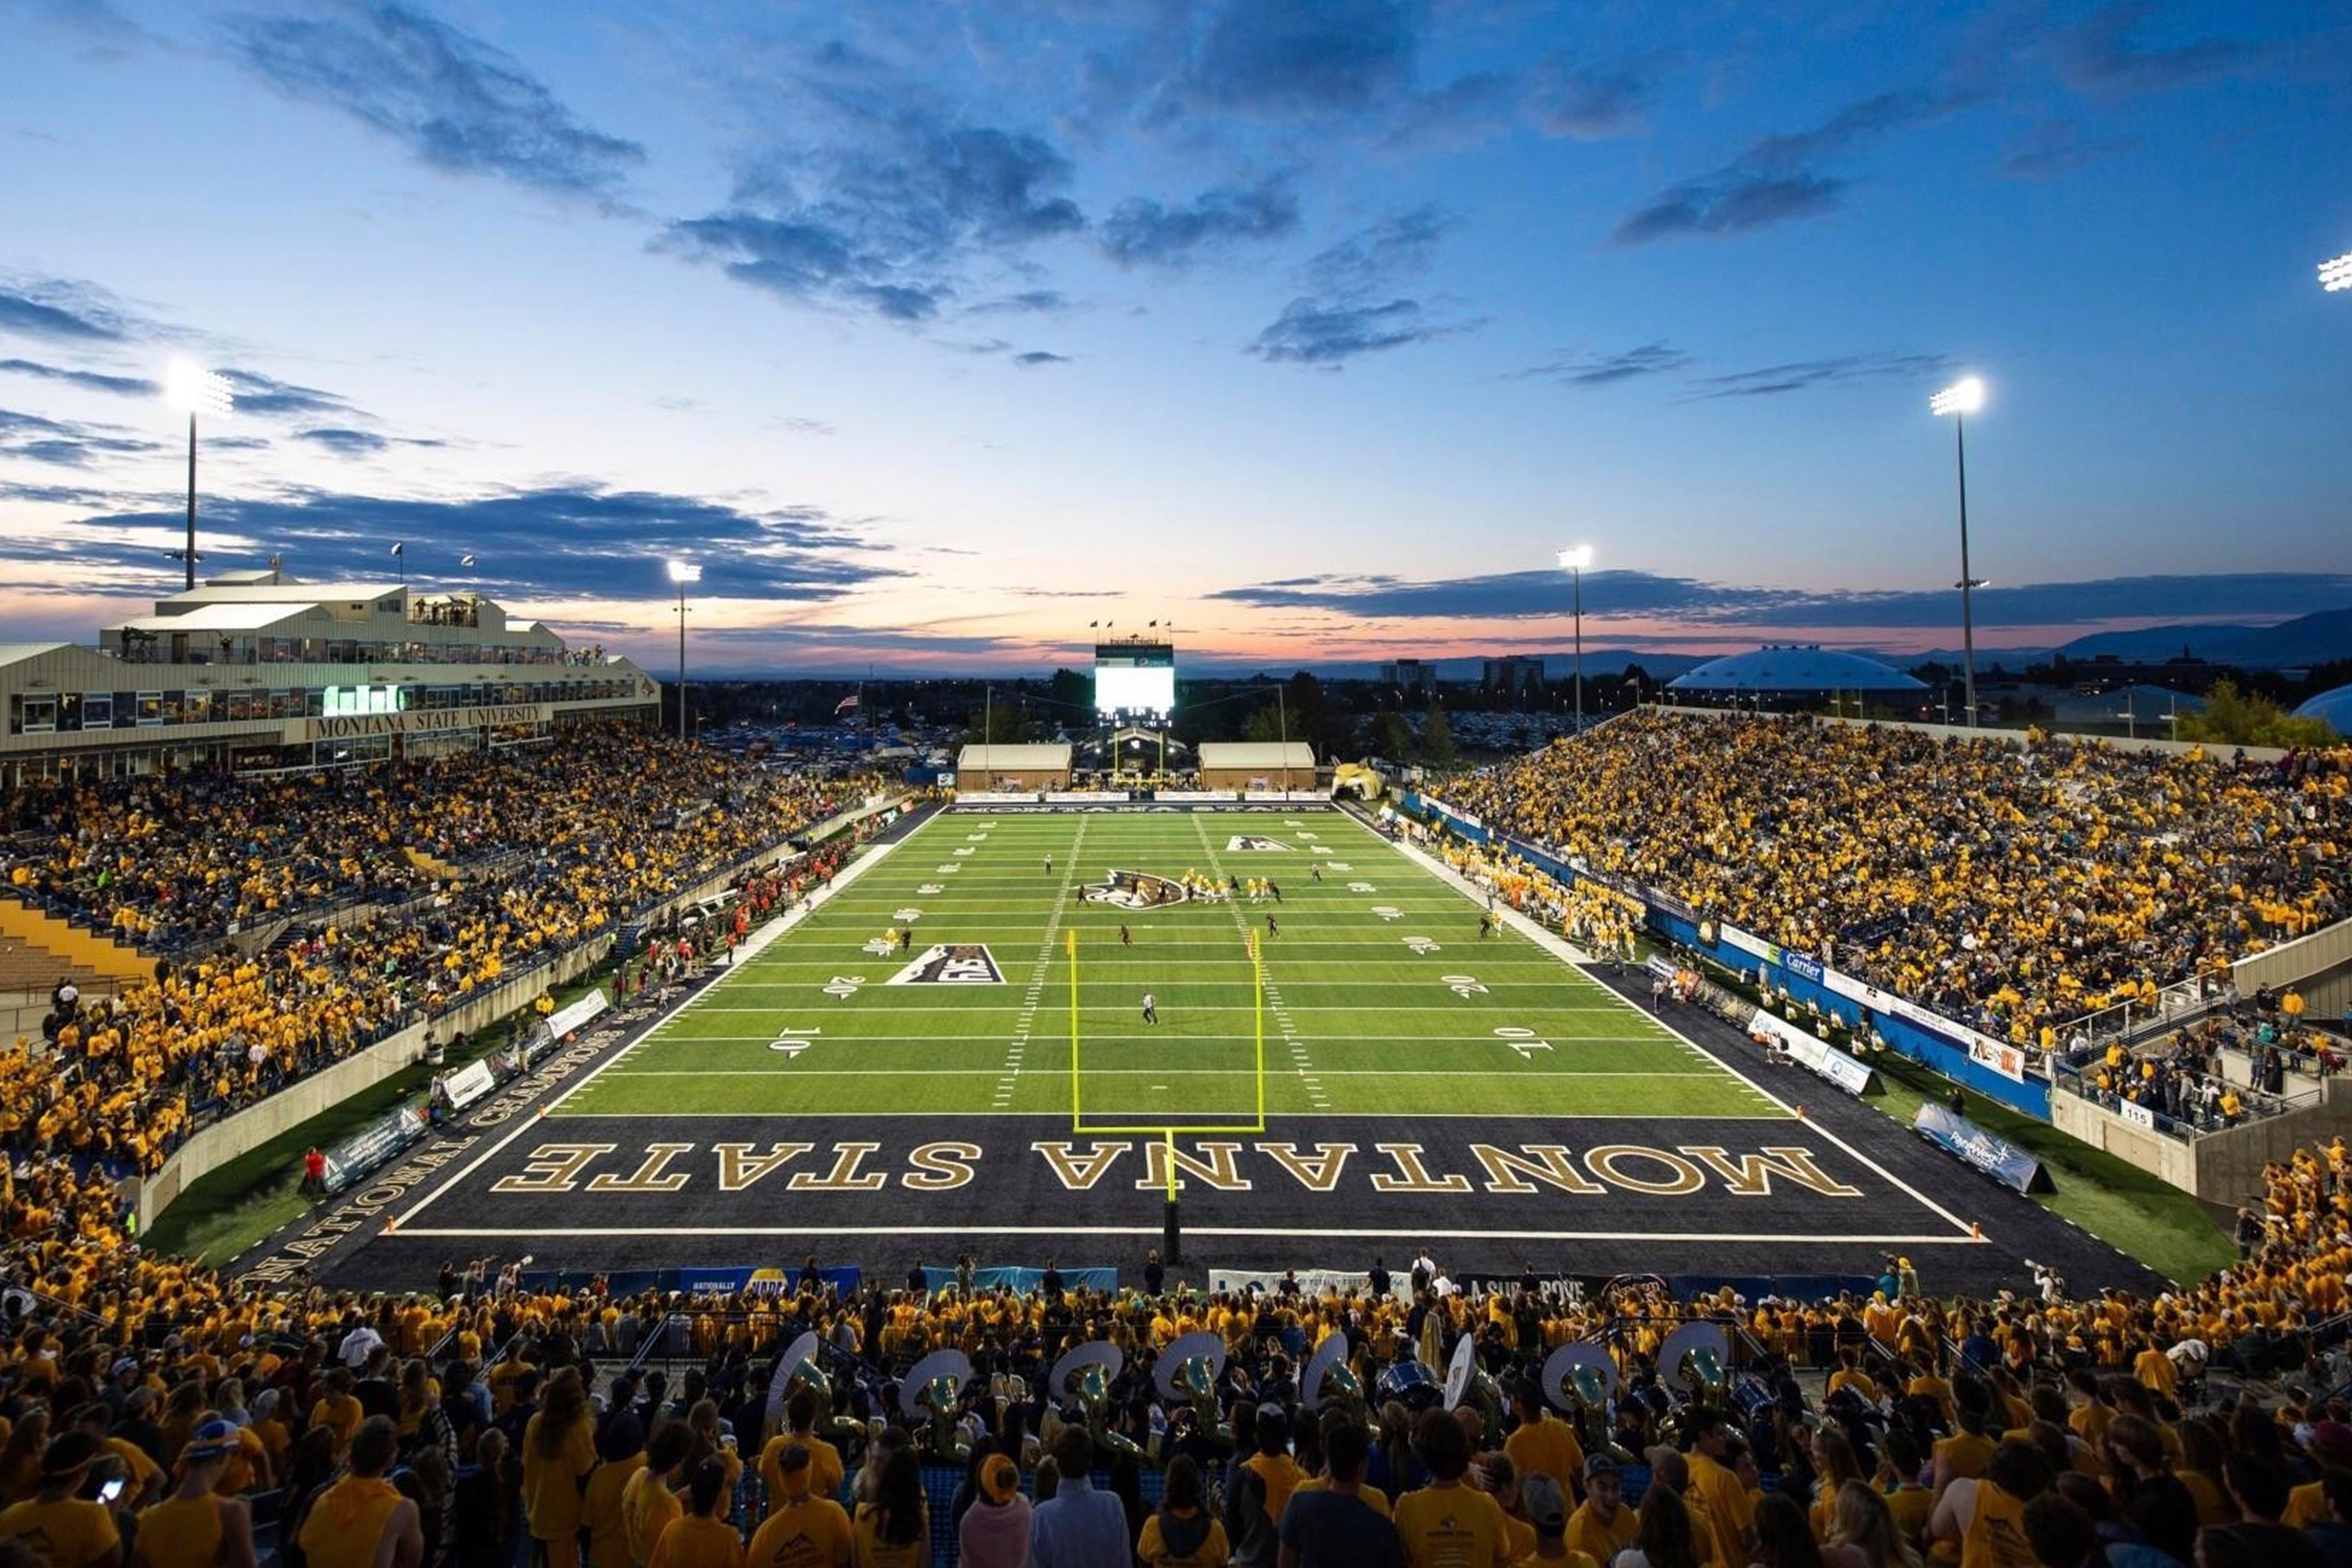 The Montana State University Football Stadium